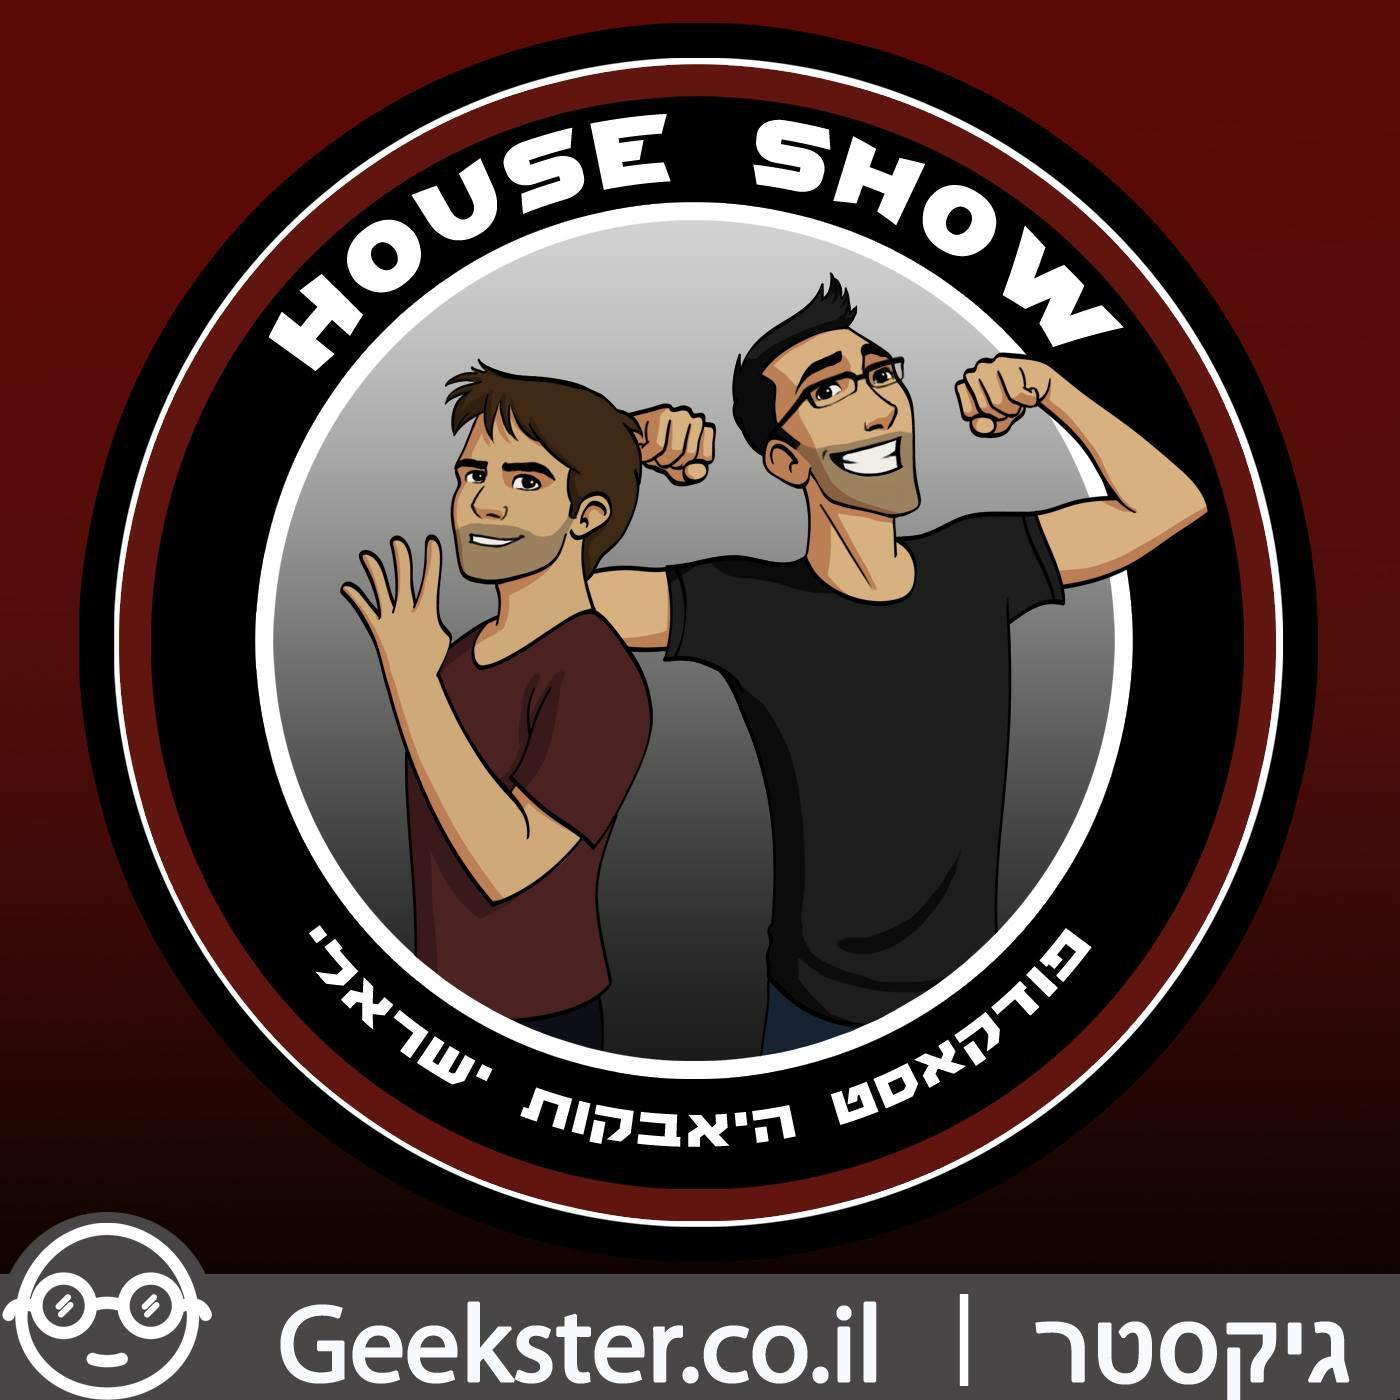 House Show - האוס שואו - Geekster